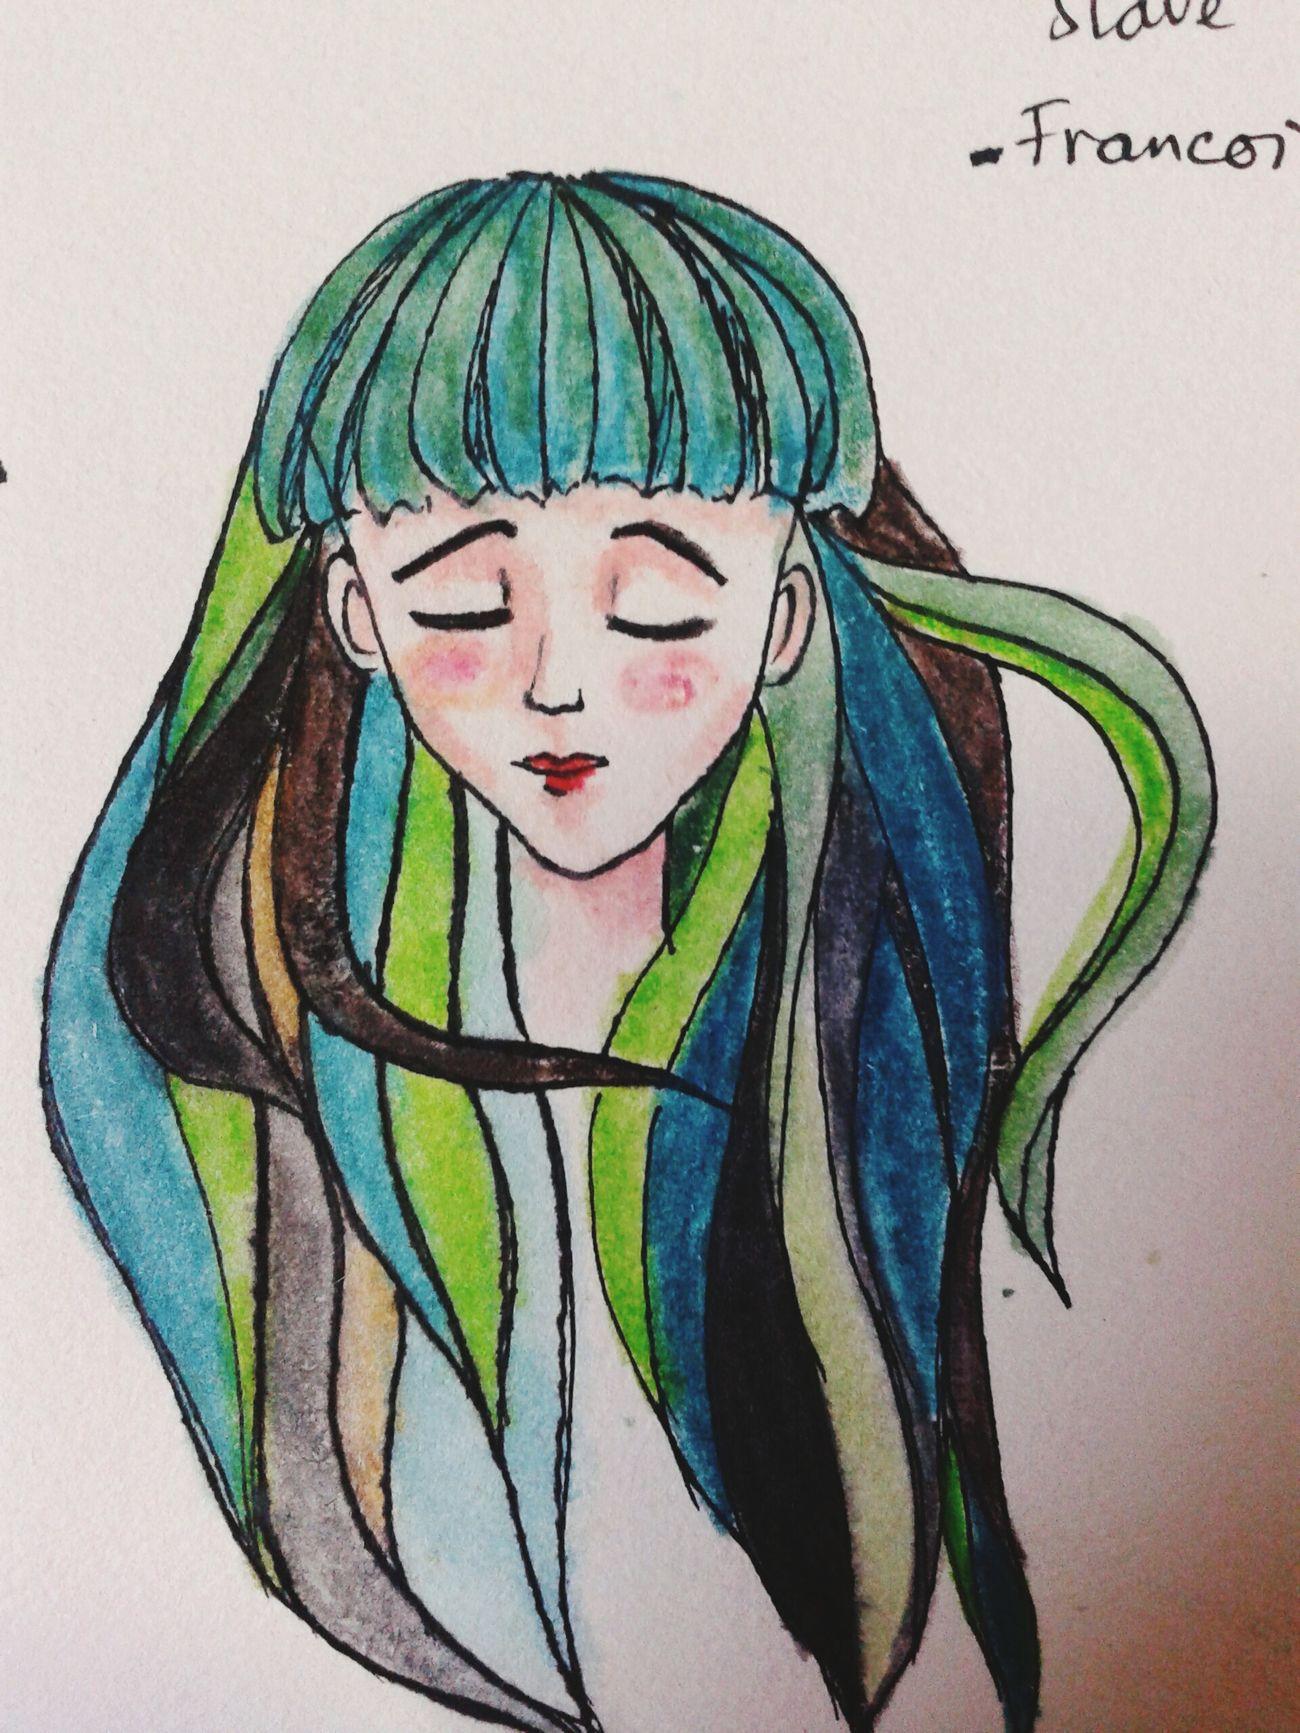 Greengirl Girl Morigirl  My Drawing Colours Art Work Dream Sleeping Hurt